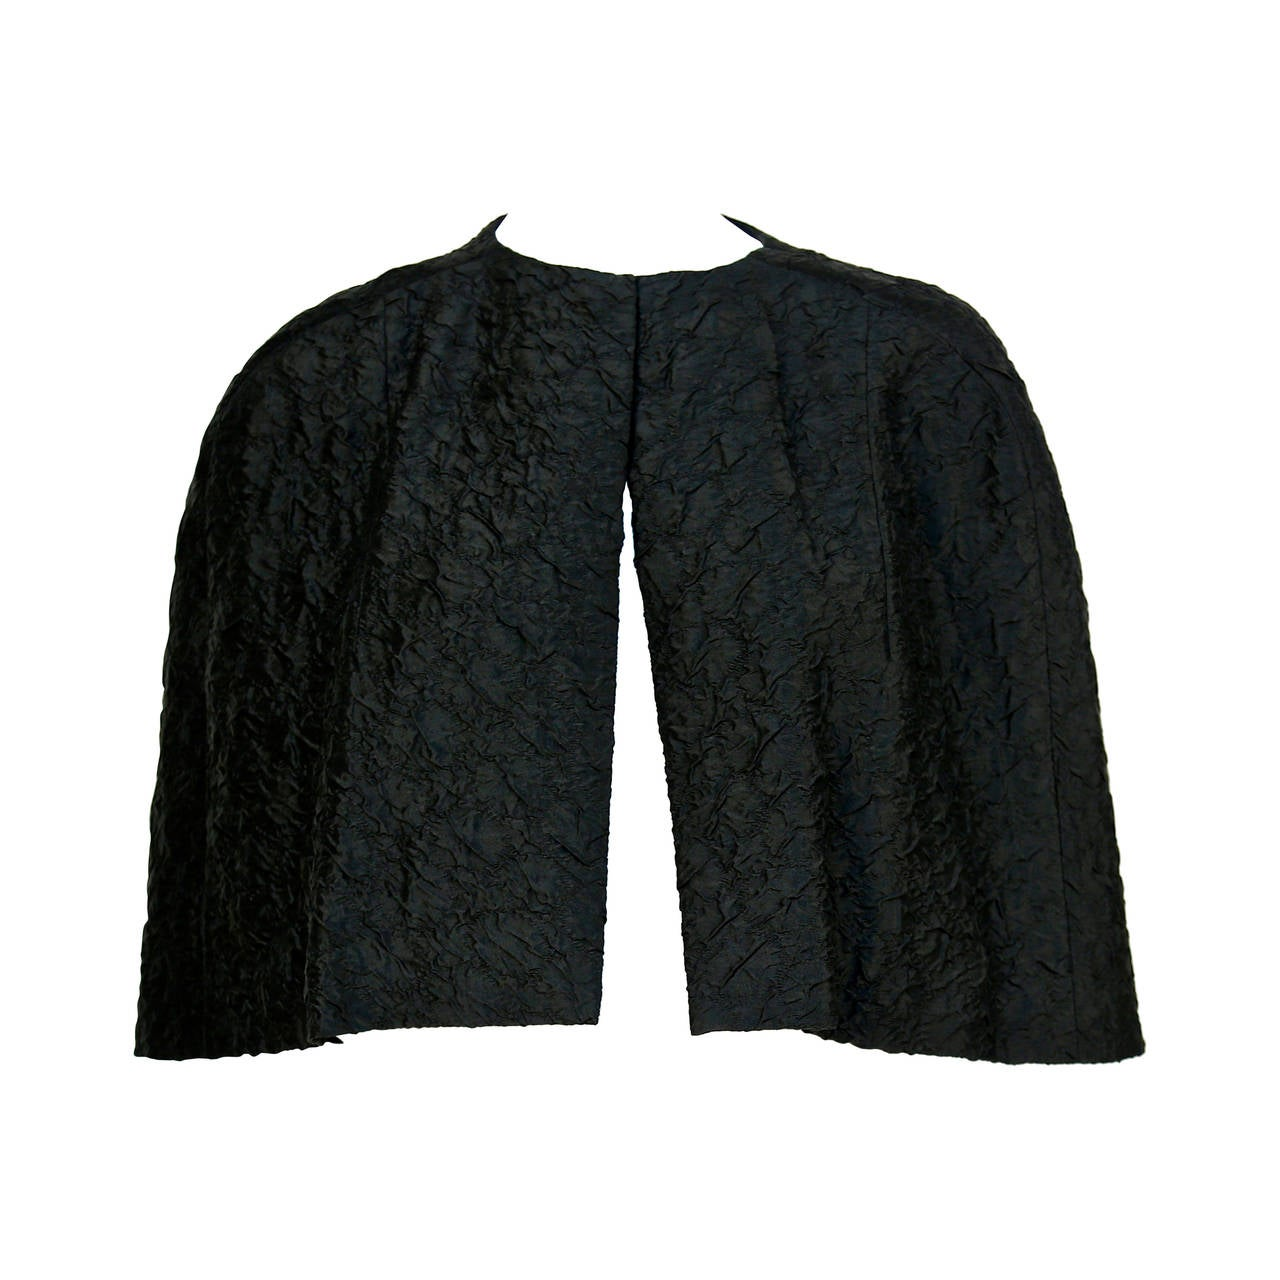 1960's CRISTOBAL BALENCIAGA EISA haute couture black silk capelet 1